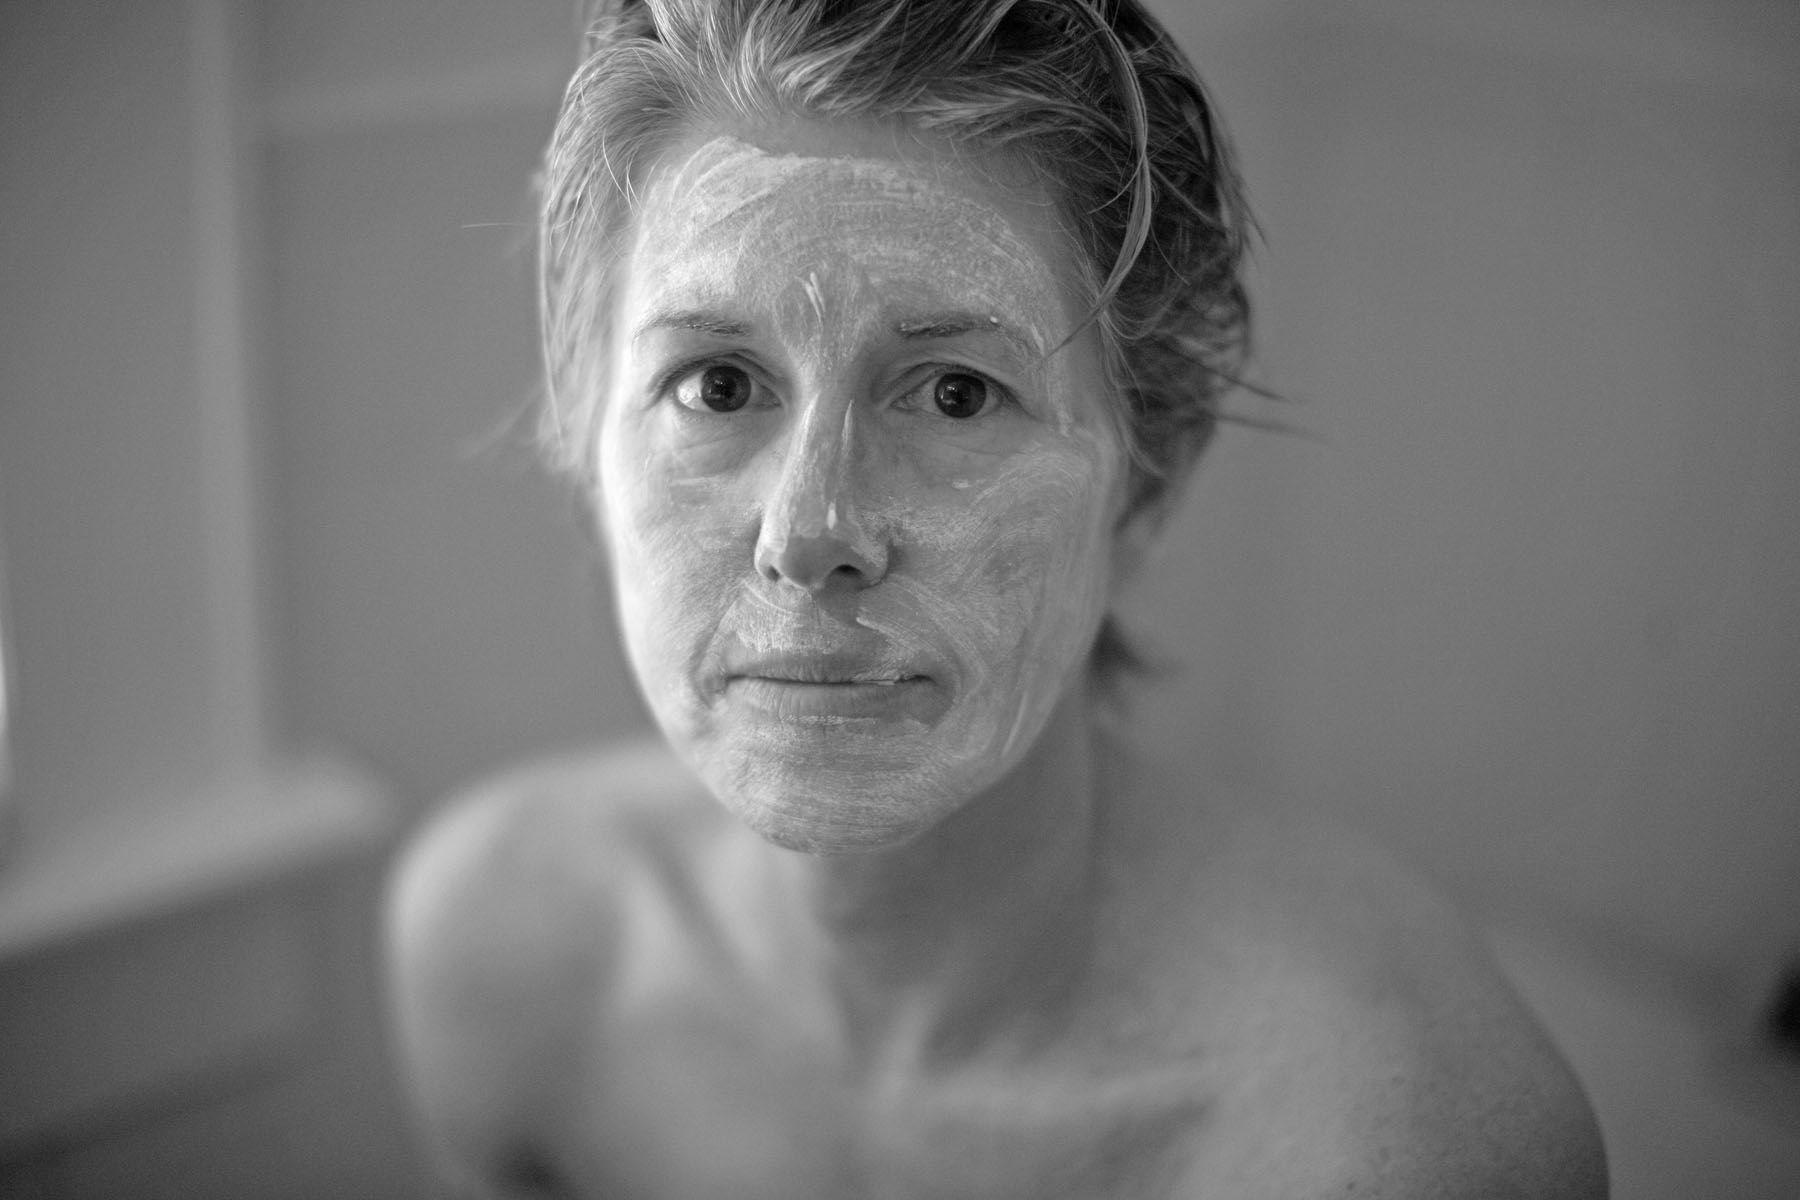 Trudie, Beauty Mask, 2011